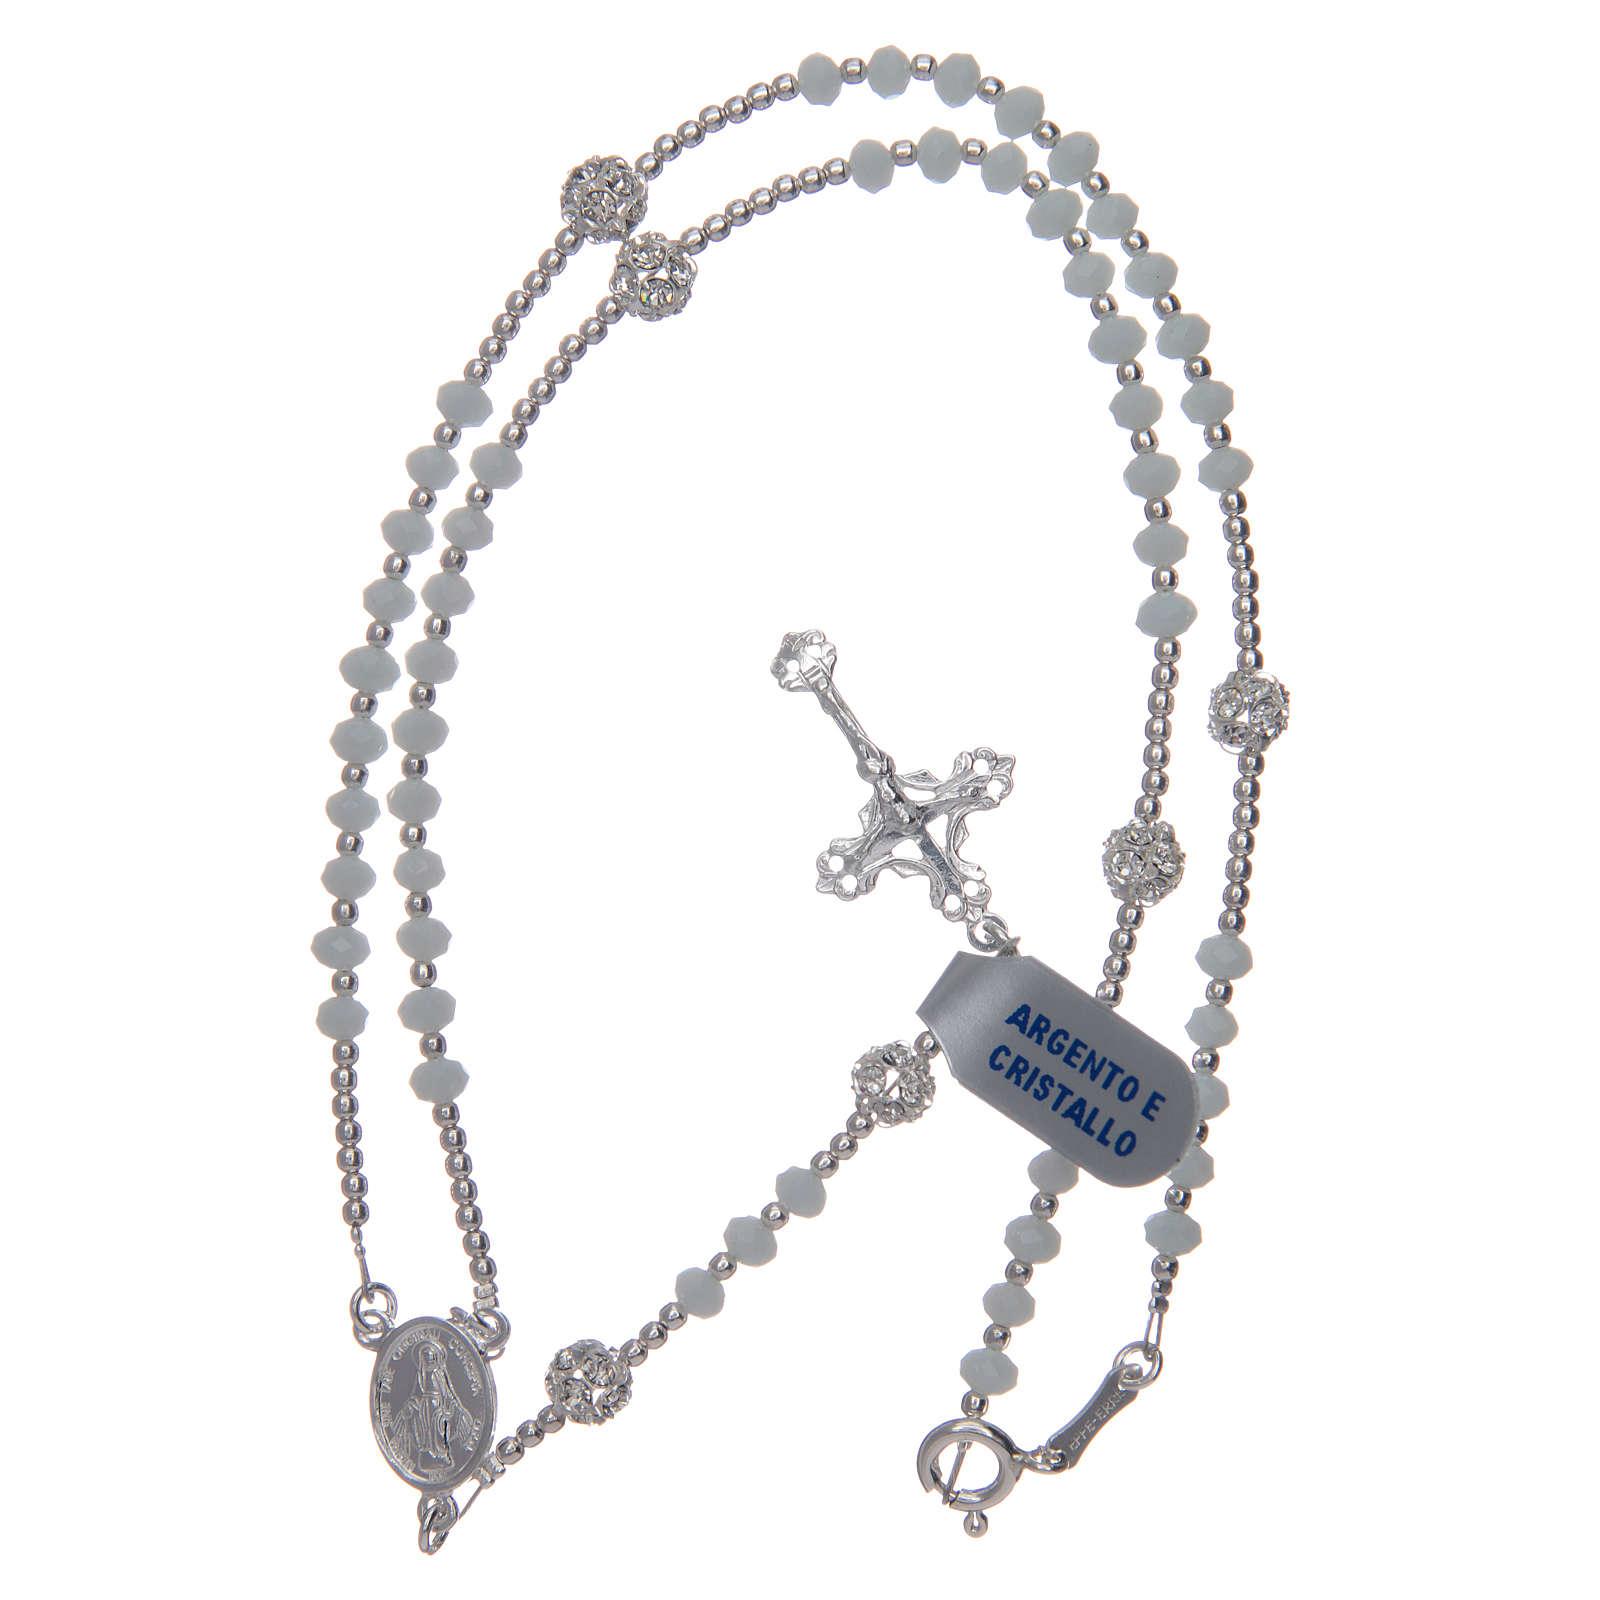 Różaniec srebro 925 i kryształ biały 3 mm 4